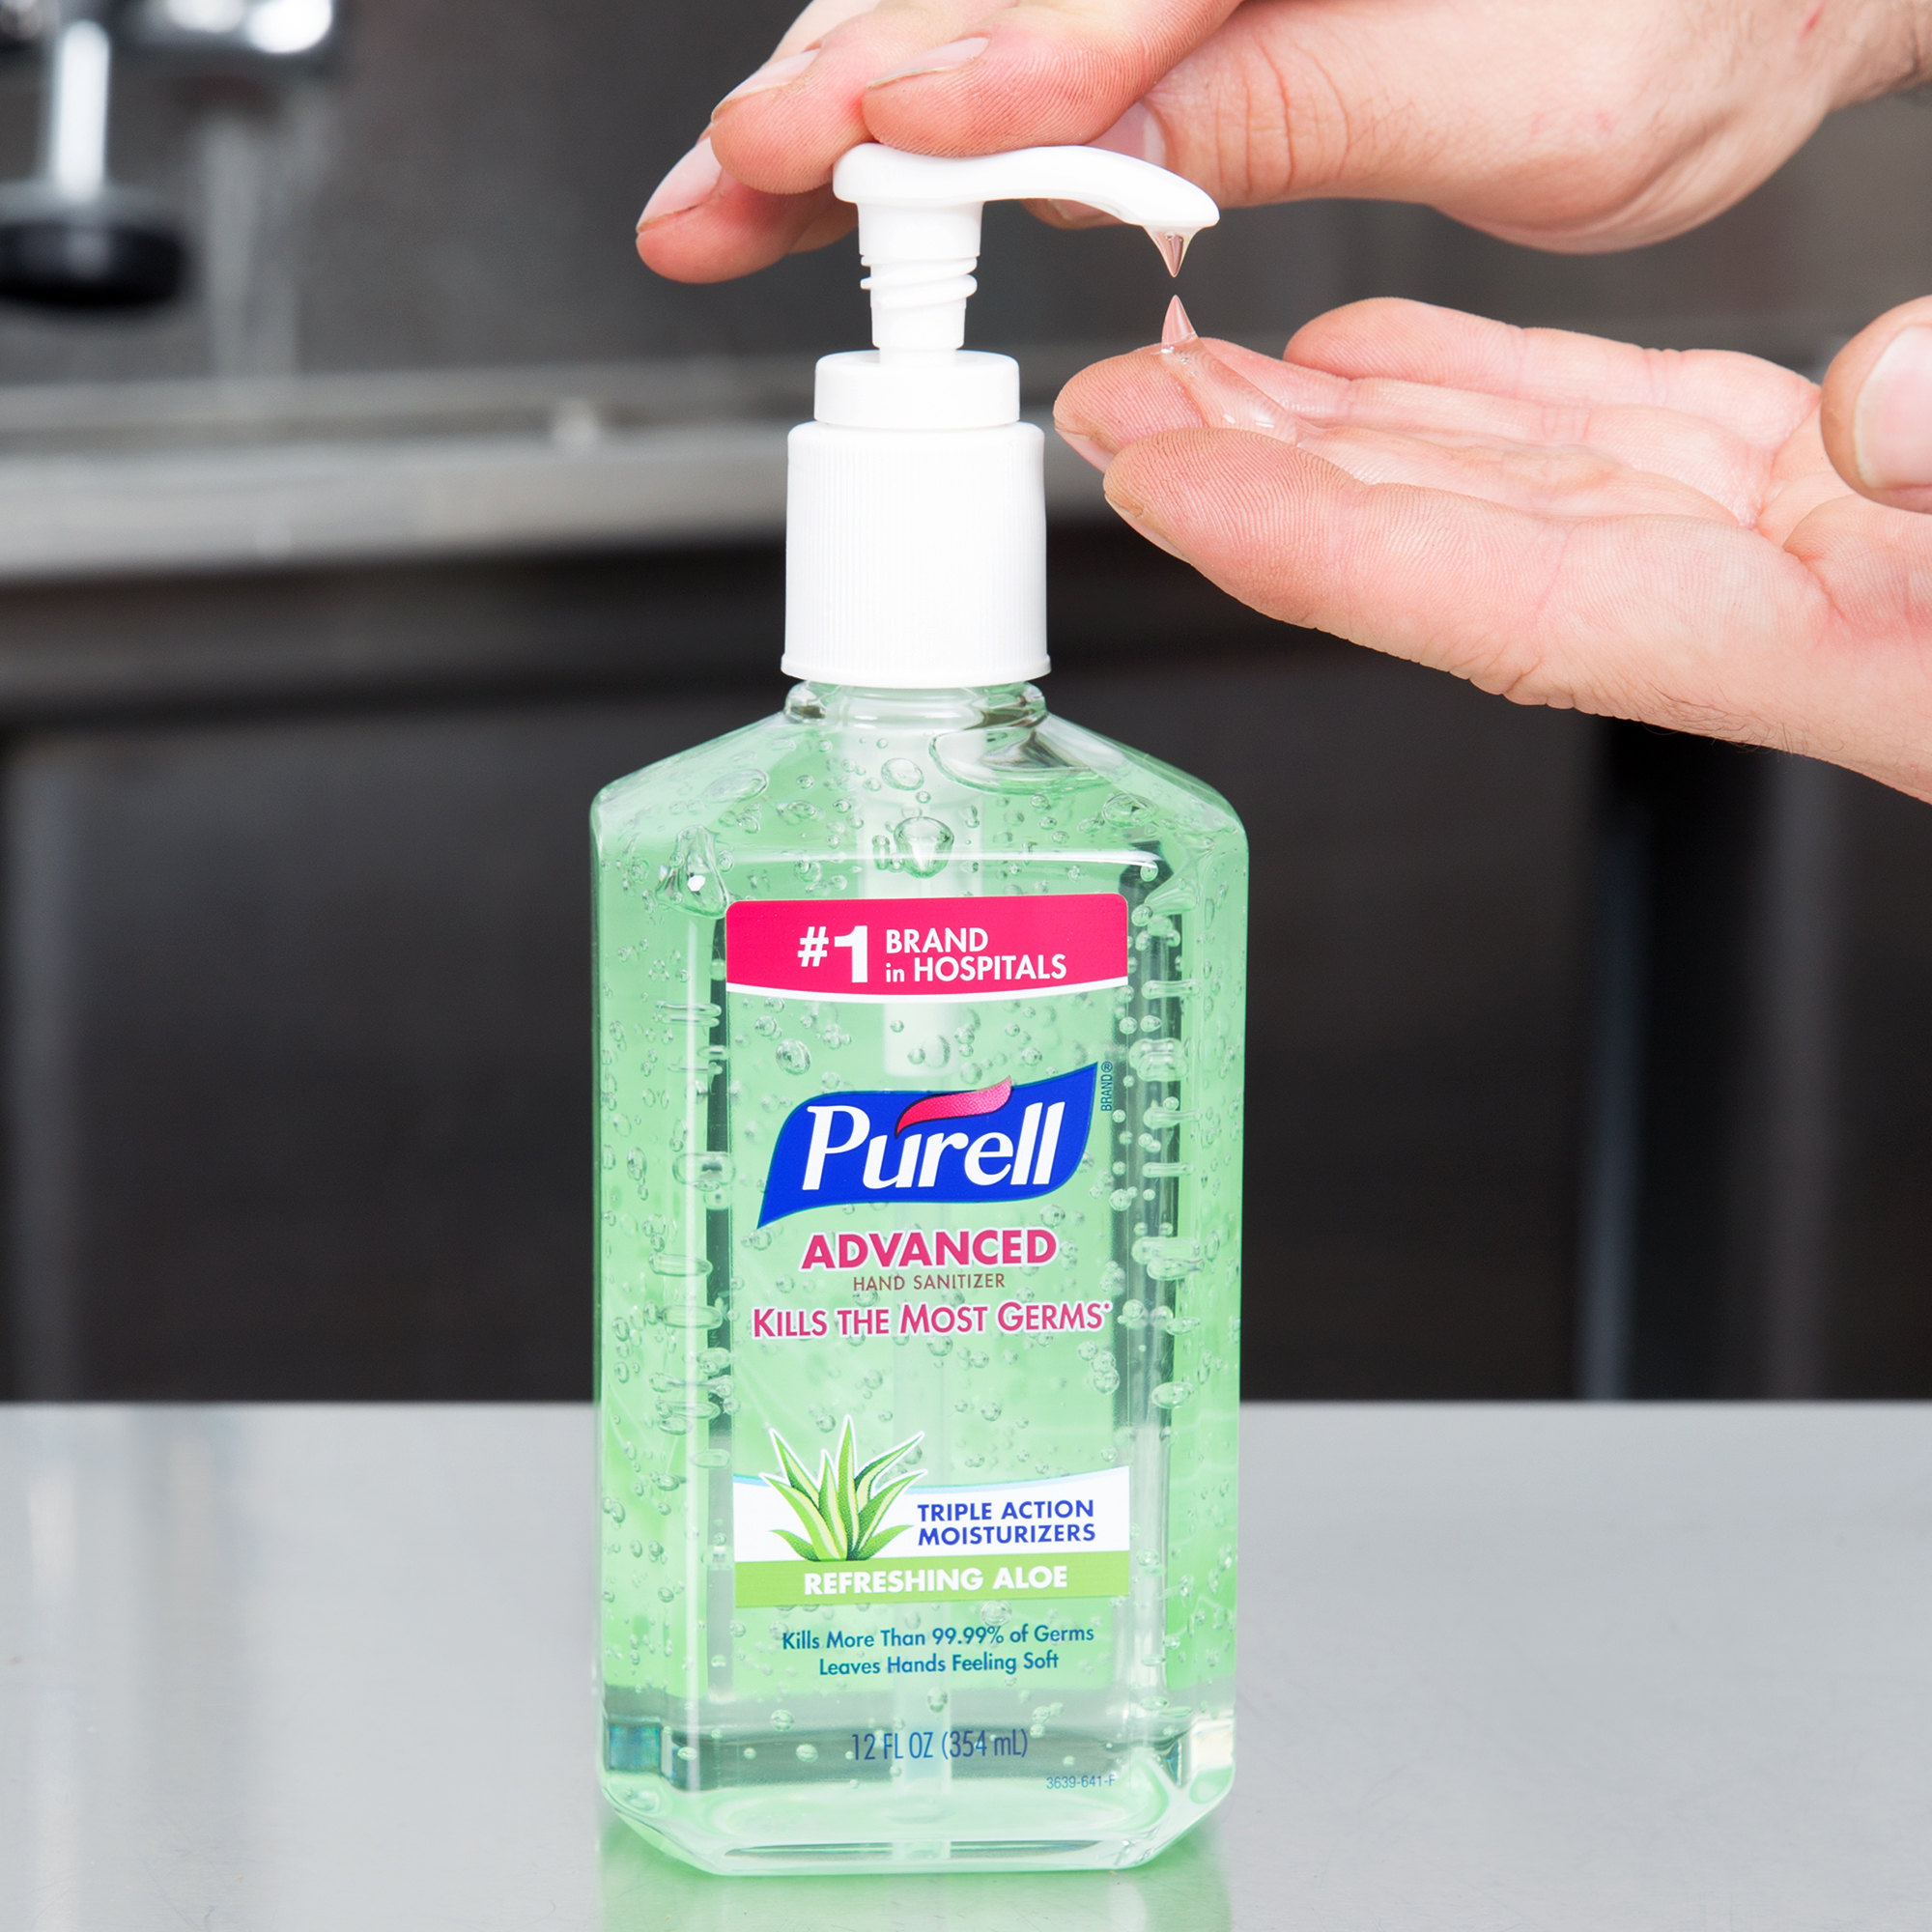 Purell Hand Sanitizer Branding & Packaging Innovations